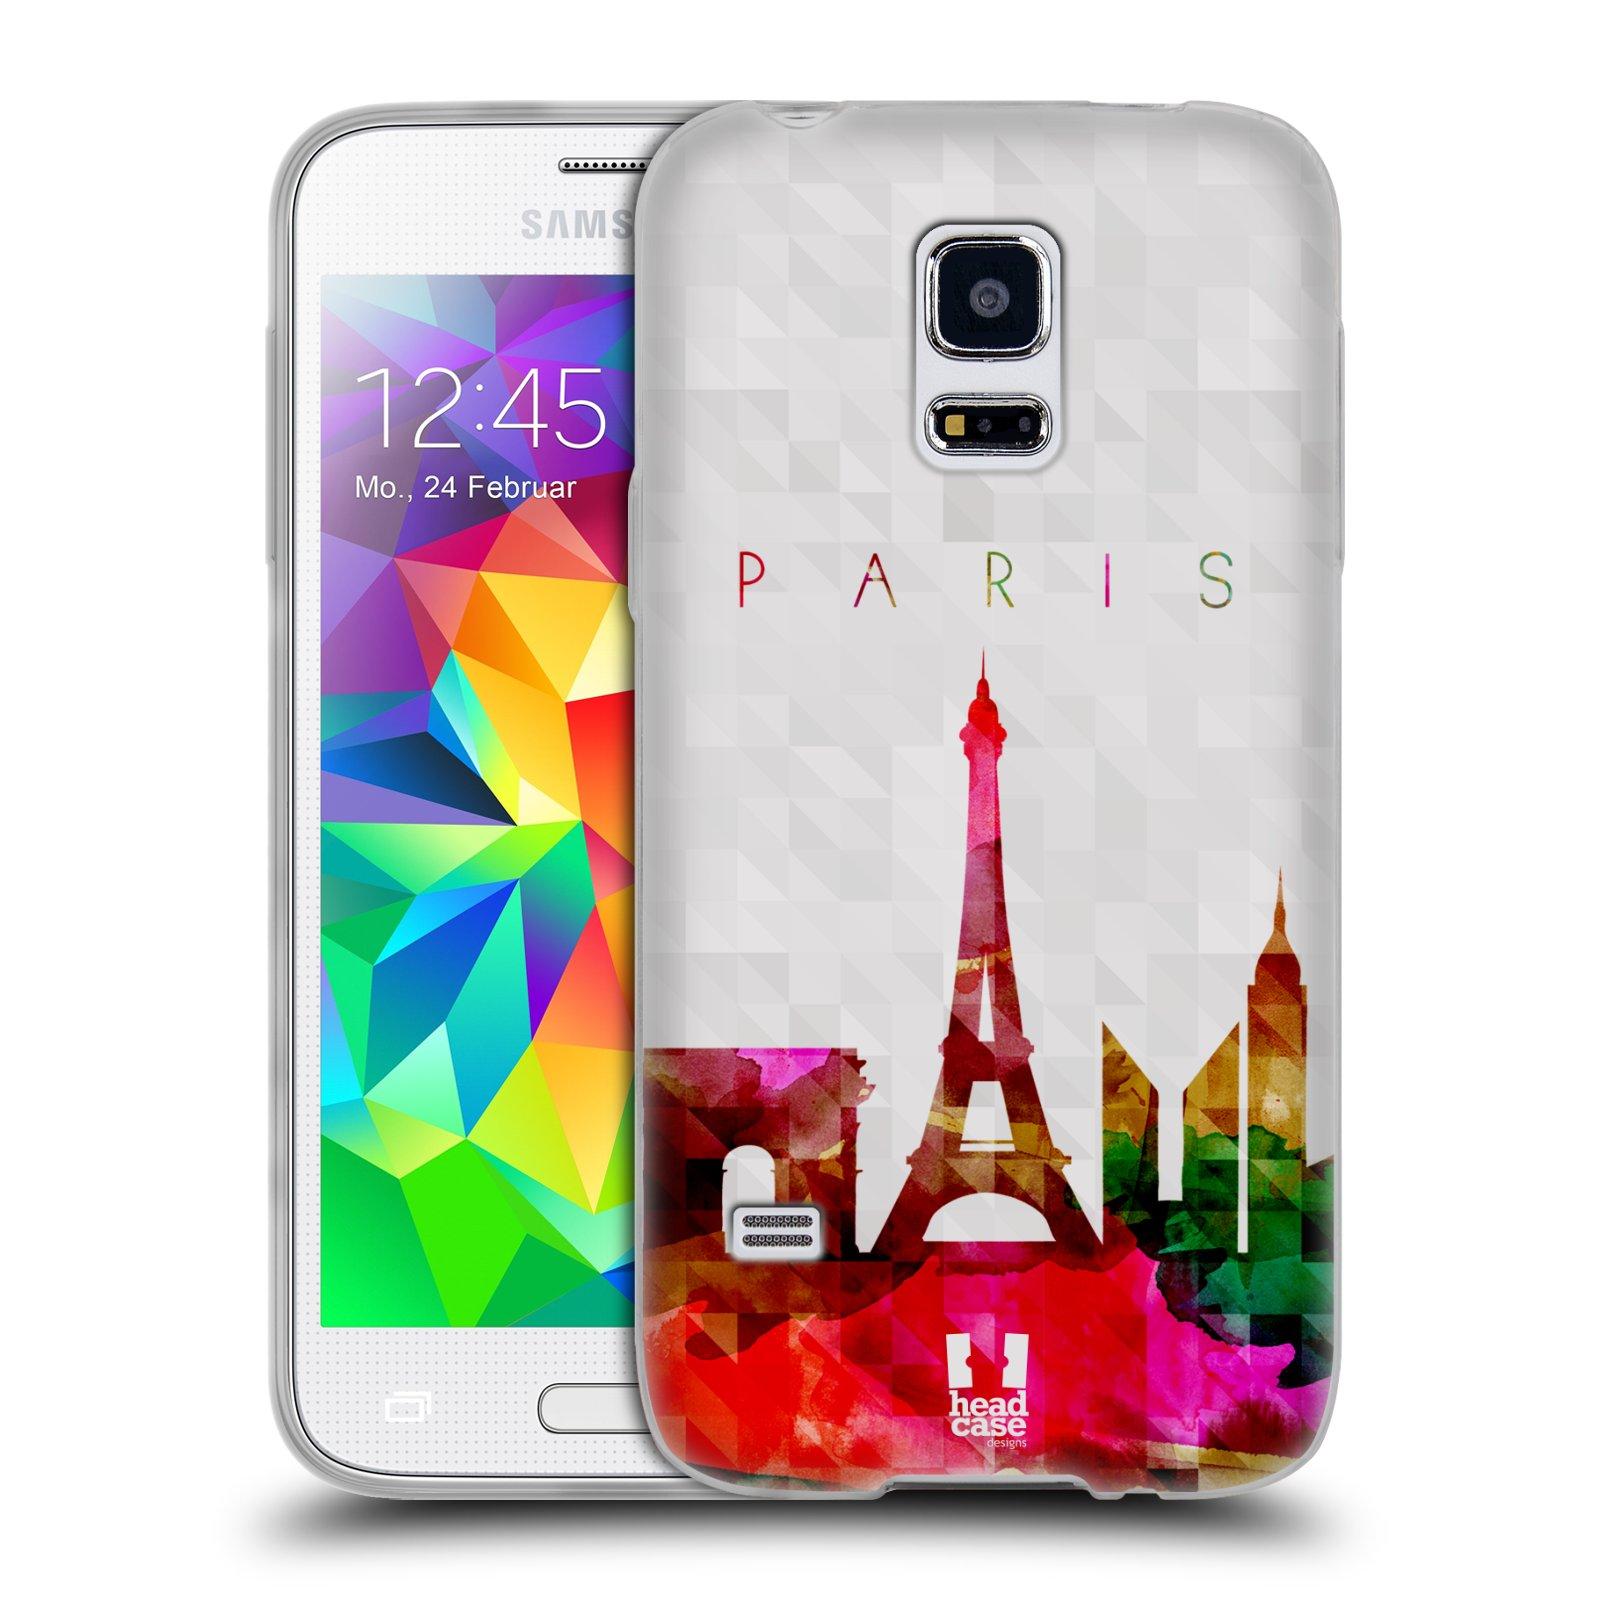 HEAD CASE silikonový obal na mobil Samsung Galaxy S5 MINI vzor Vodní barva  města silueta PAŘÍŽ FRANICE EIFFELOVA VĚŽ 85944c57008